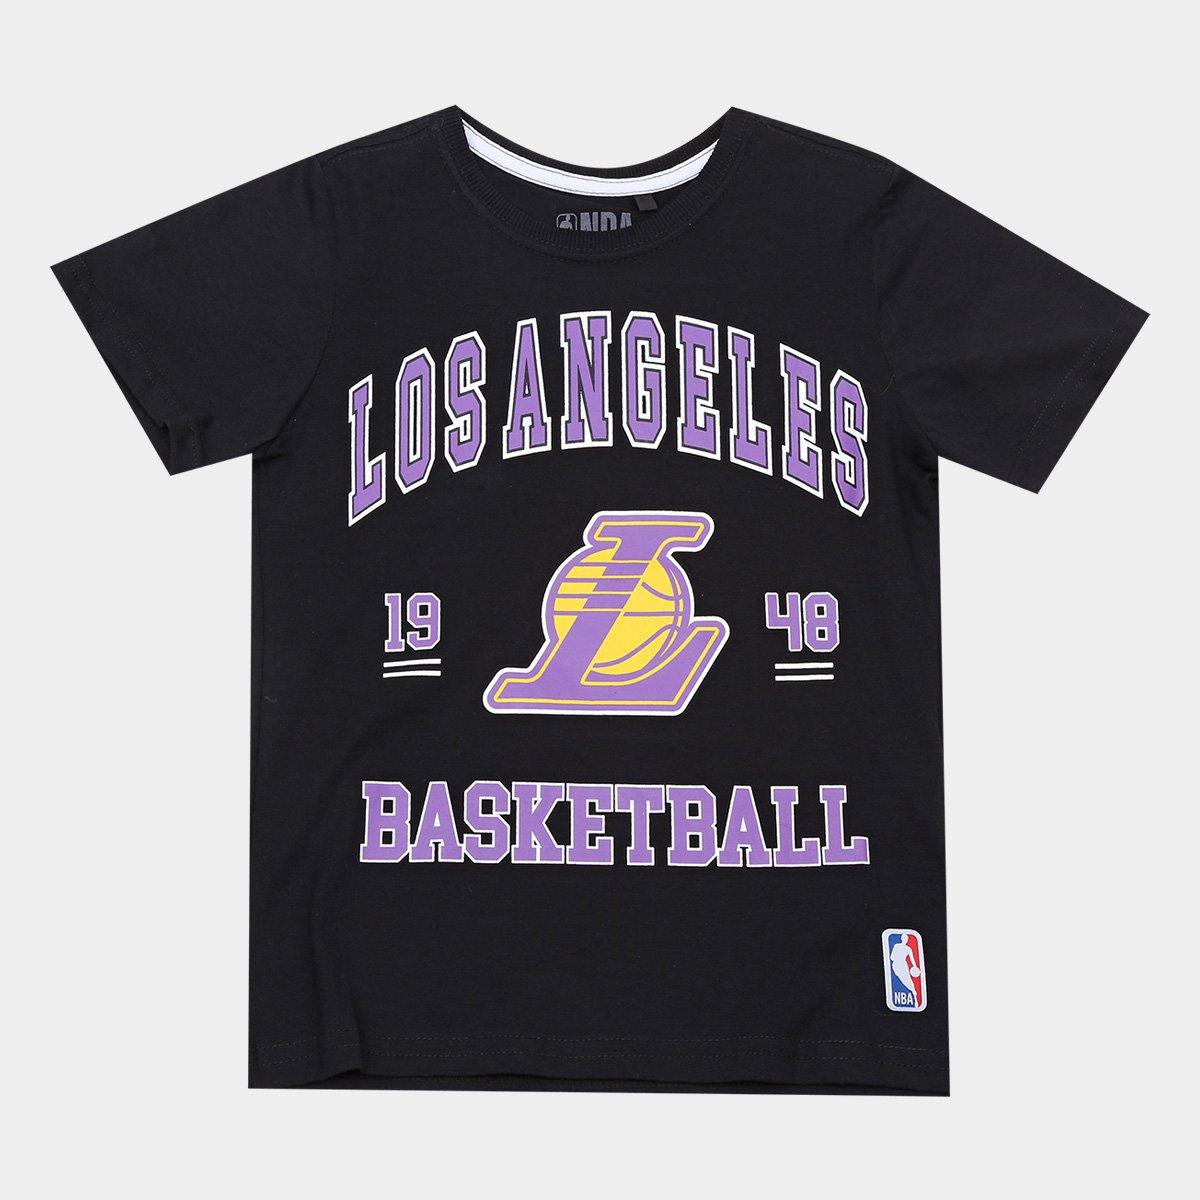 f91bc1958 Camiseta NBA Infantil Los Angeles Lakers College - Preto - Compre Agora